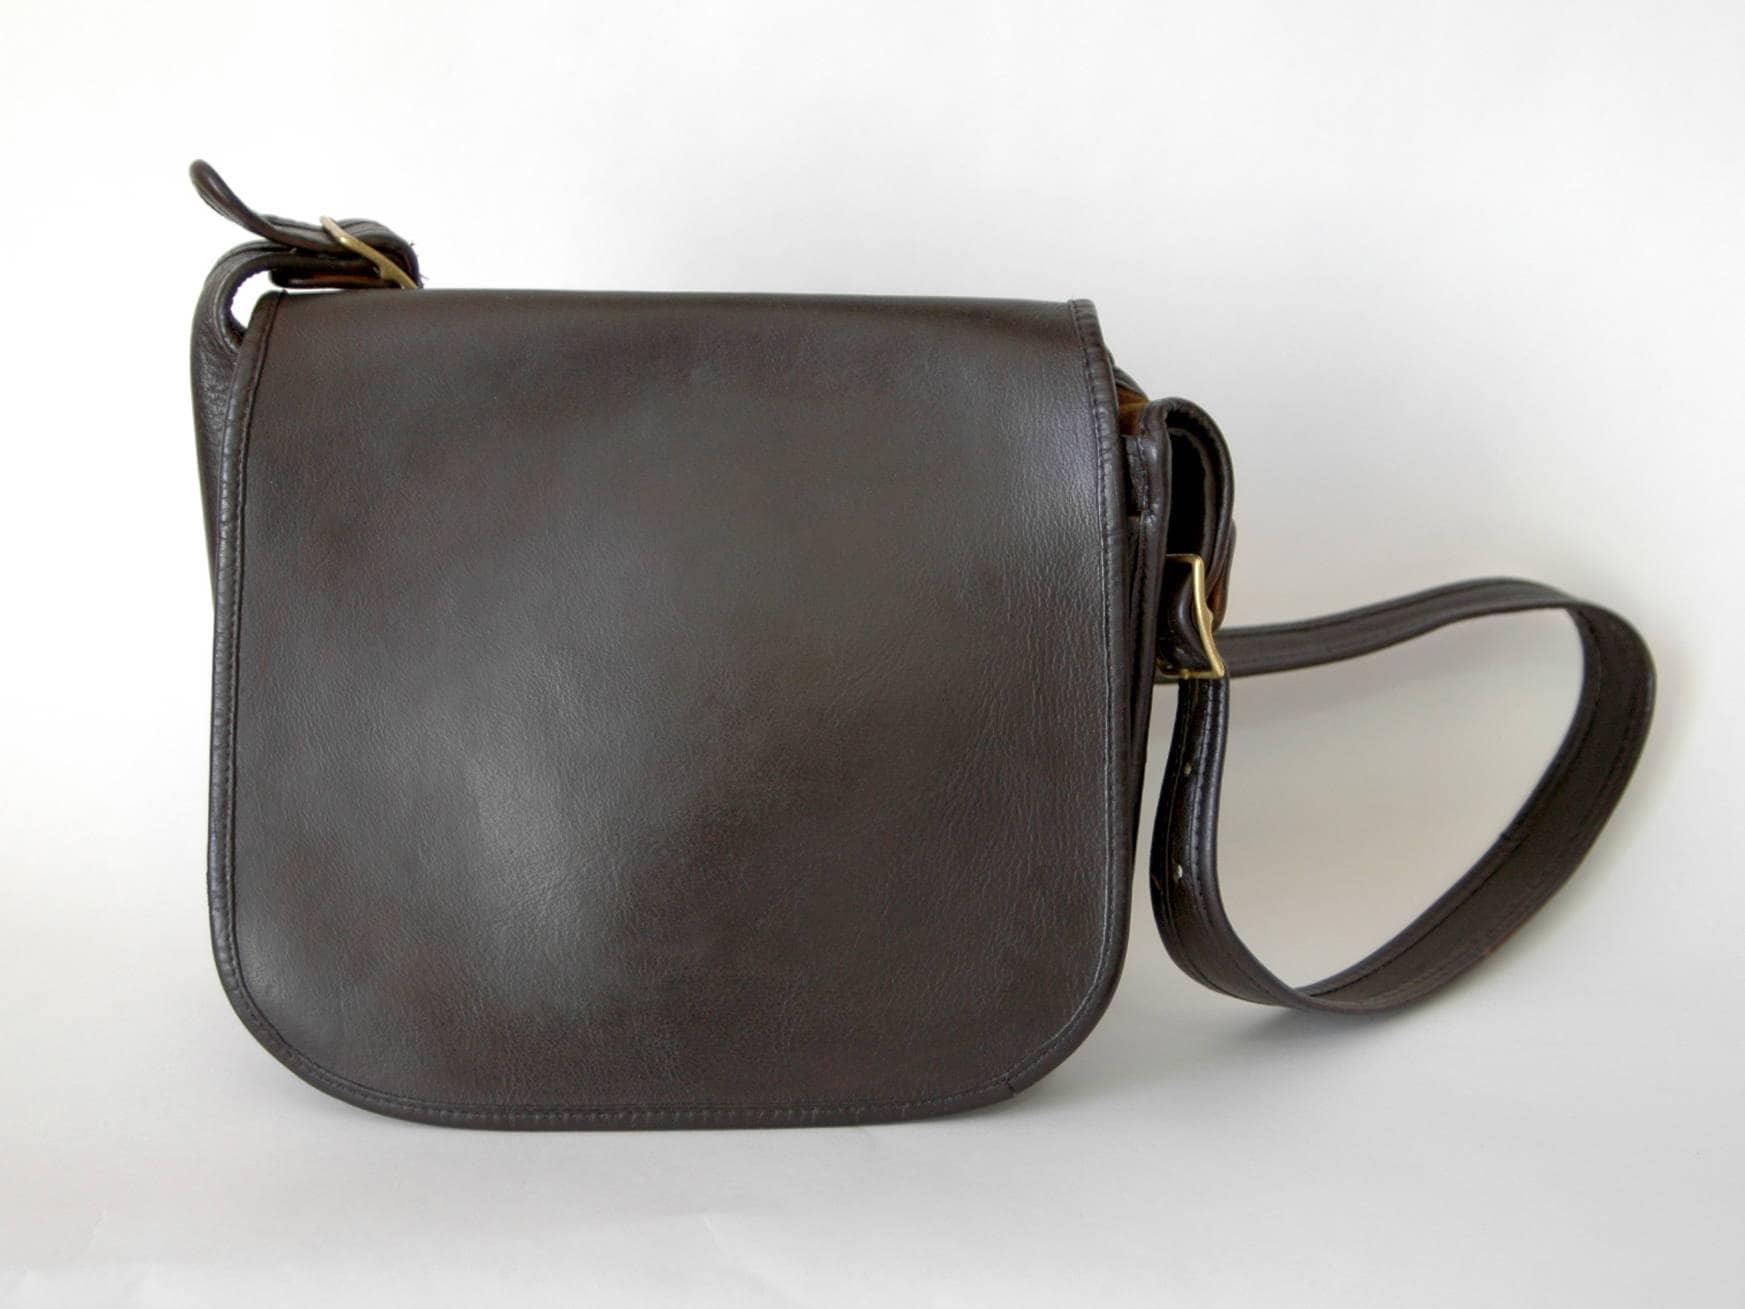 f02010b2 70s Dark Brown Leather Coach Bag Made in New York Shoulder Bag - ALTERED  Dyed Vintage Coach Bag - 1970s Coach Bag Bonnie Cashin - Large Bag